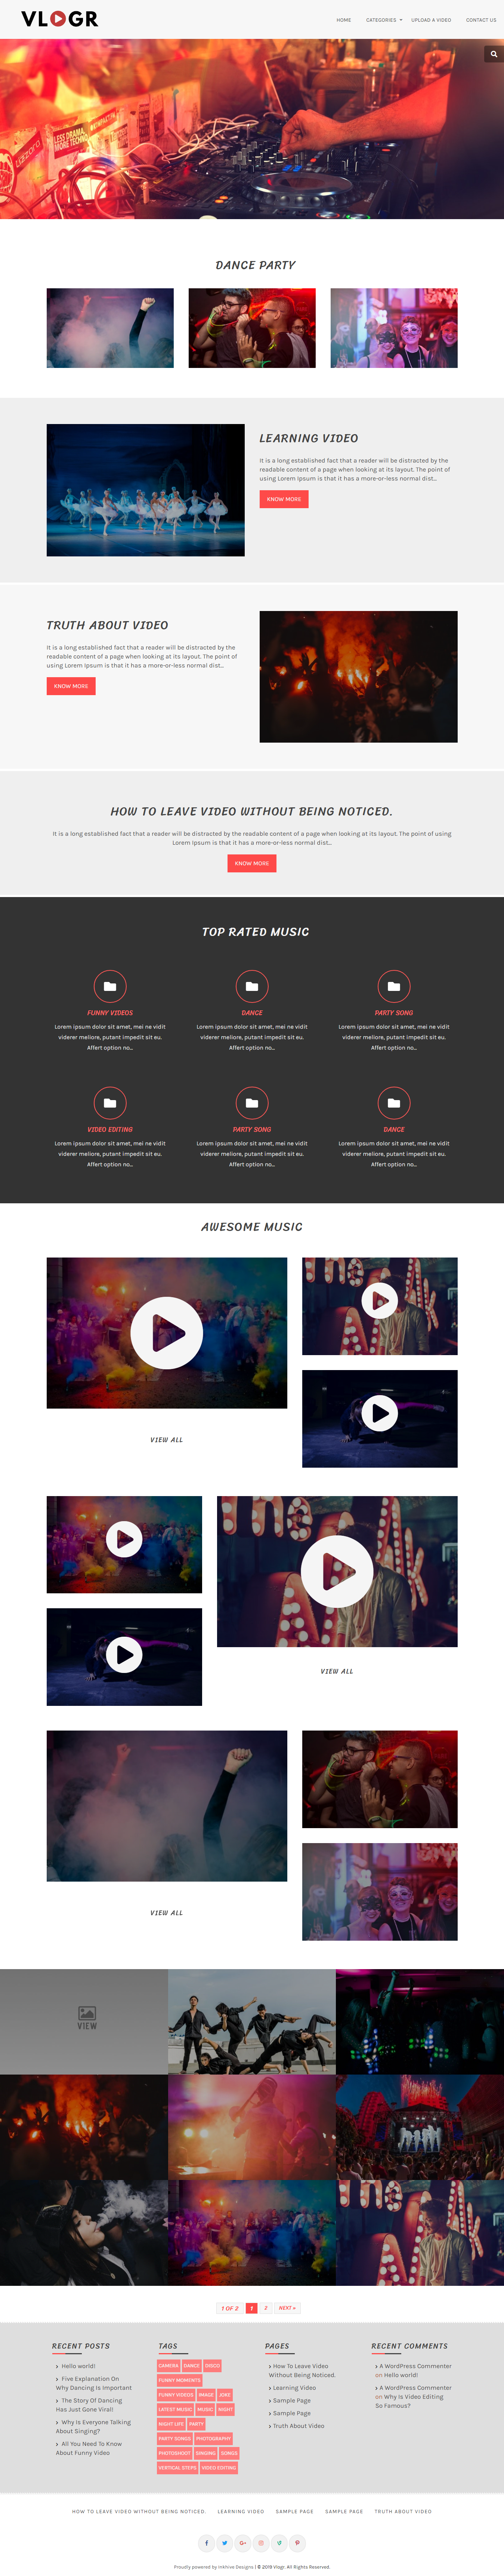 vlogr best free video and music wordpress theme - 10+ Best Free Video and Music WordPress Themes